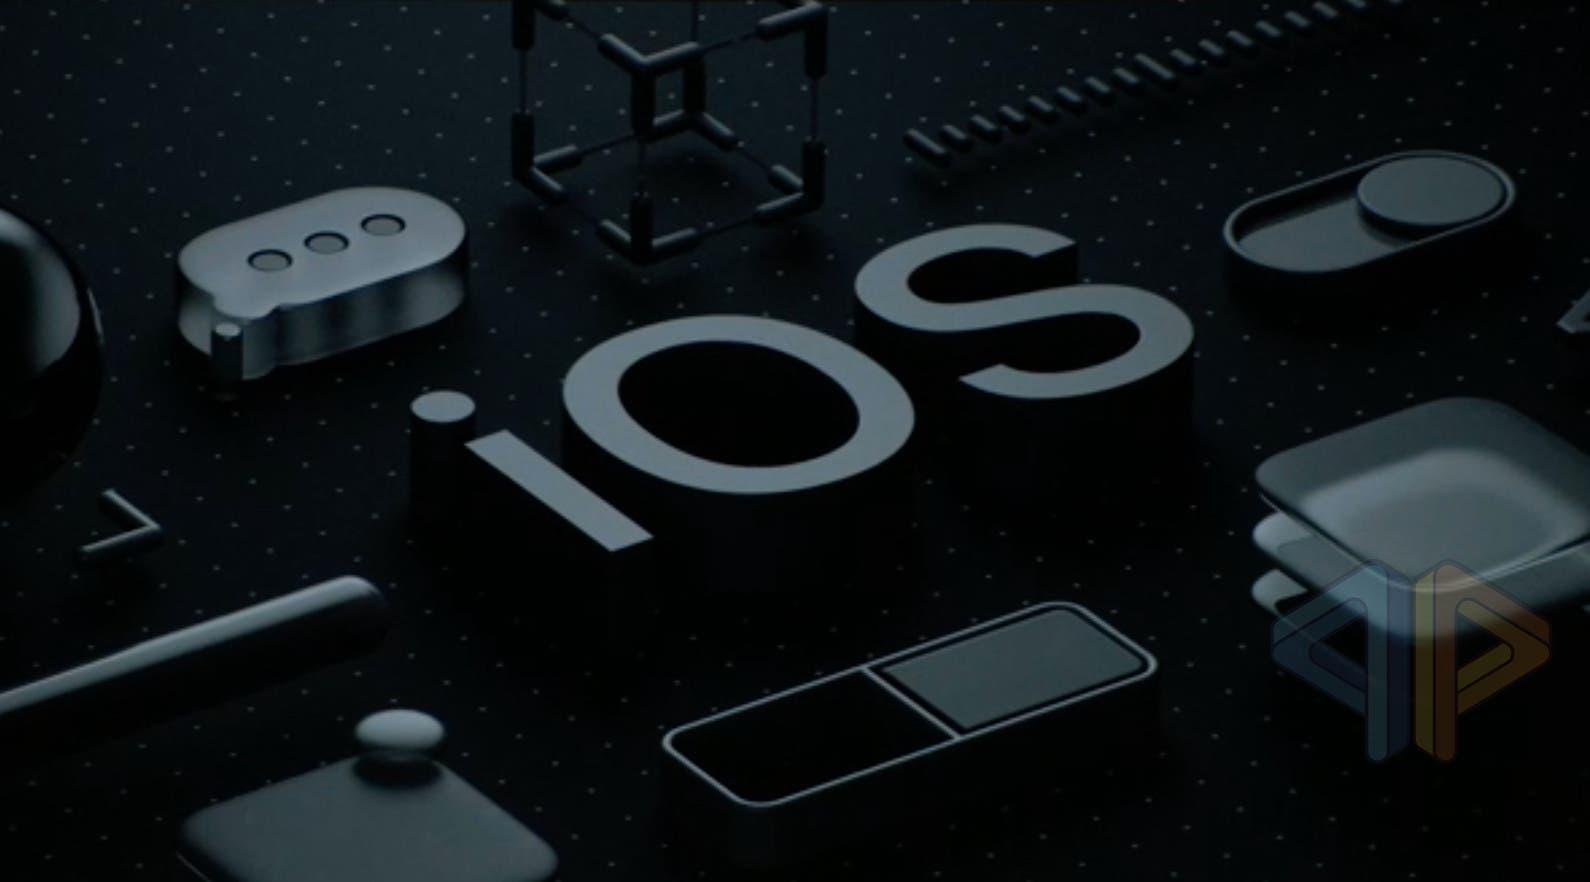 wwdc 2018 apple stellt neues ios 12 betriebssystem f r. Black Bedroom Furniture Sets. Home Design Ideas